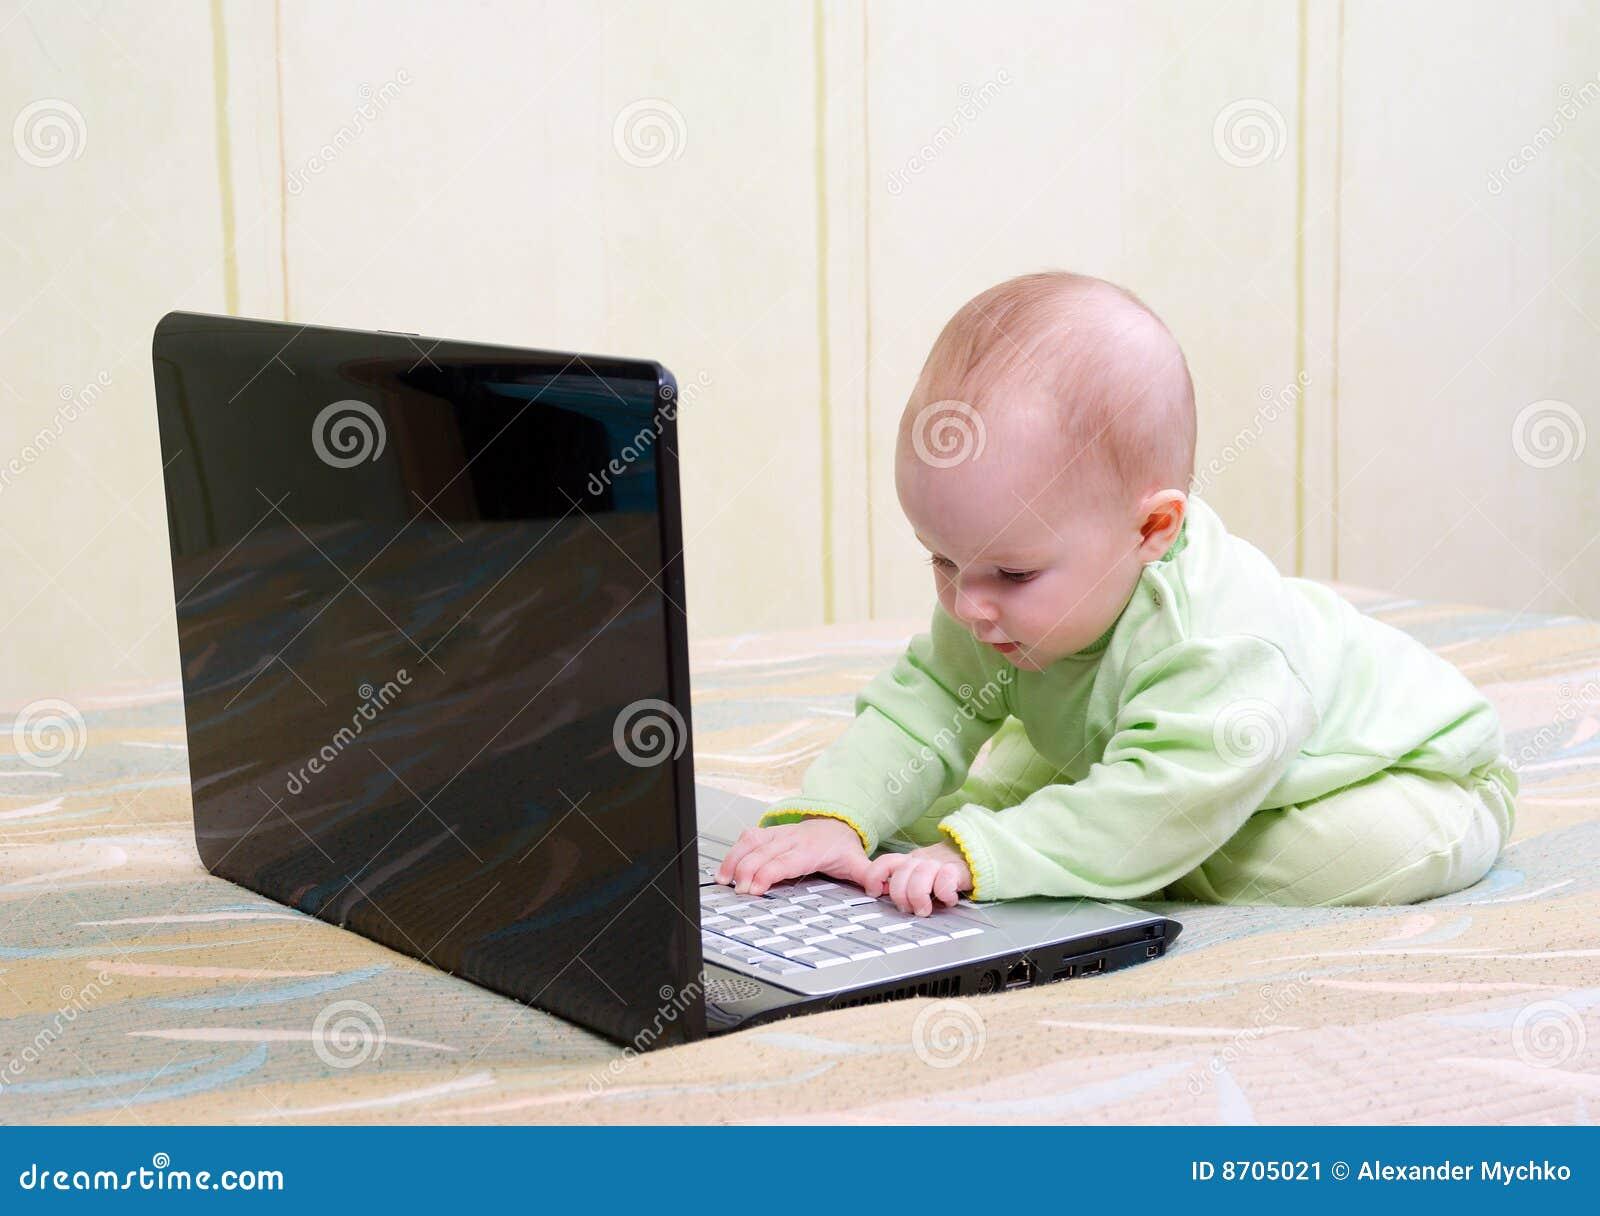 laptop spiele kostenlos